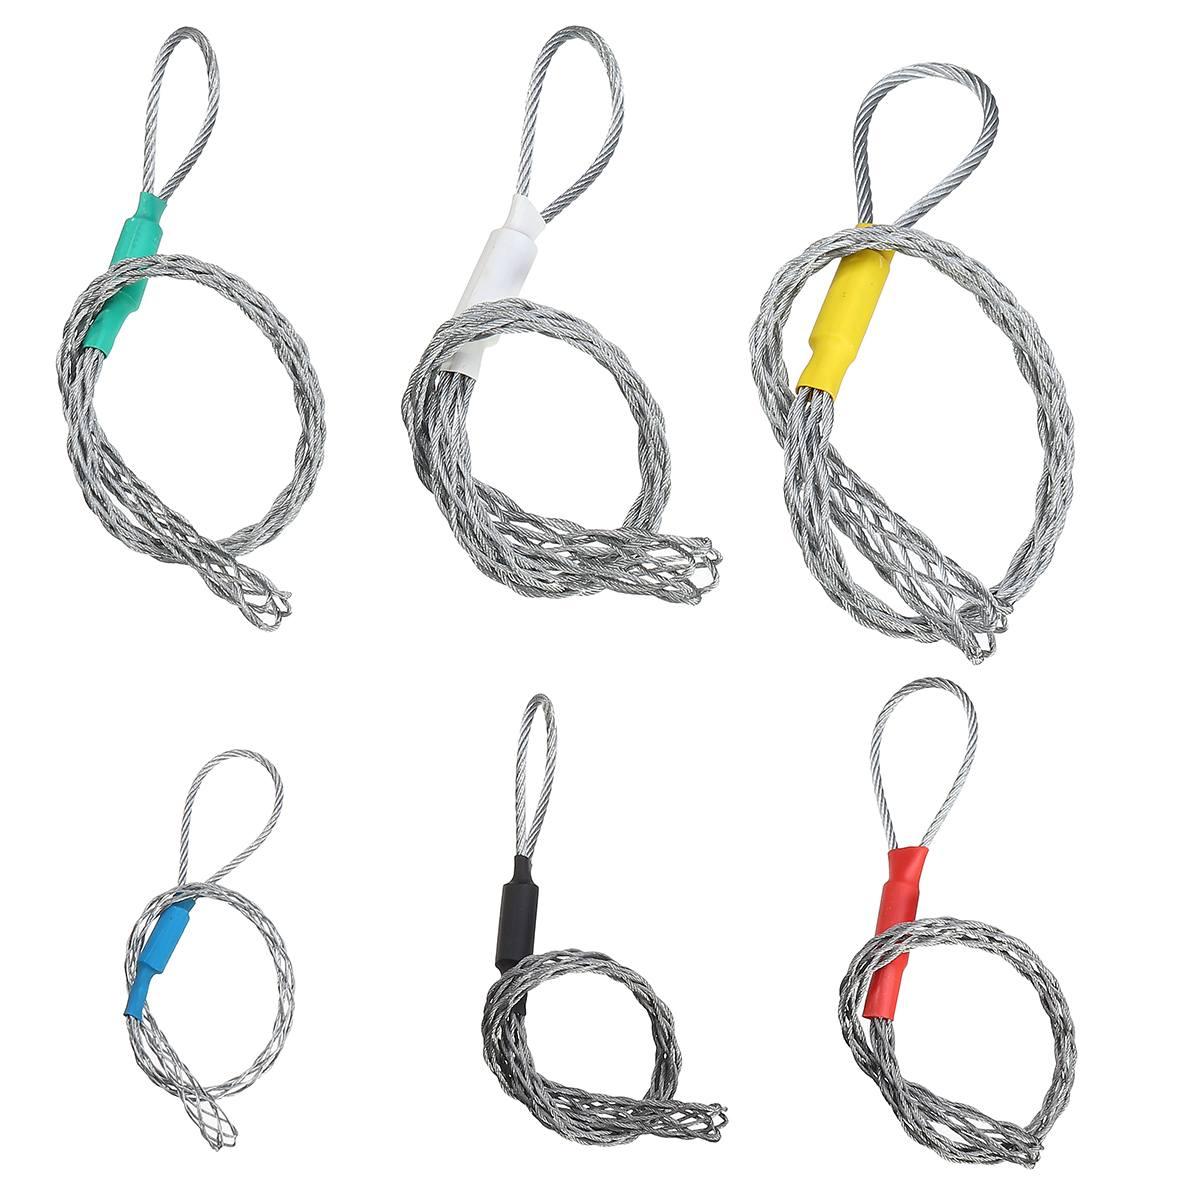 Galvanizing Metal Cable Socks Antislip Pipe Conduit Cable